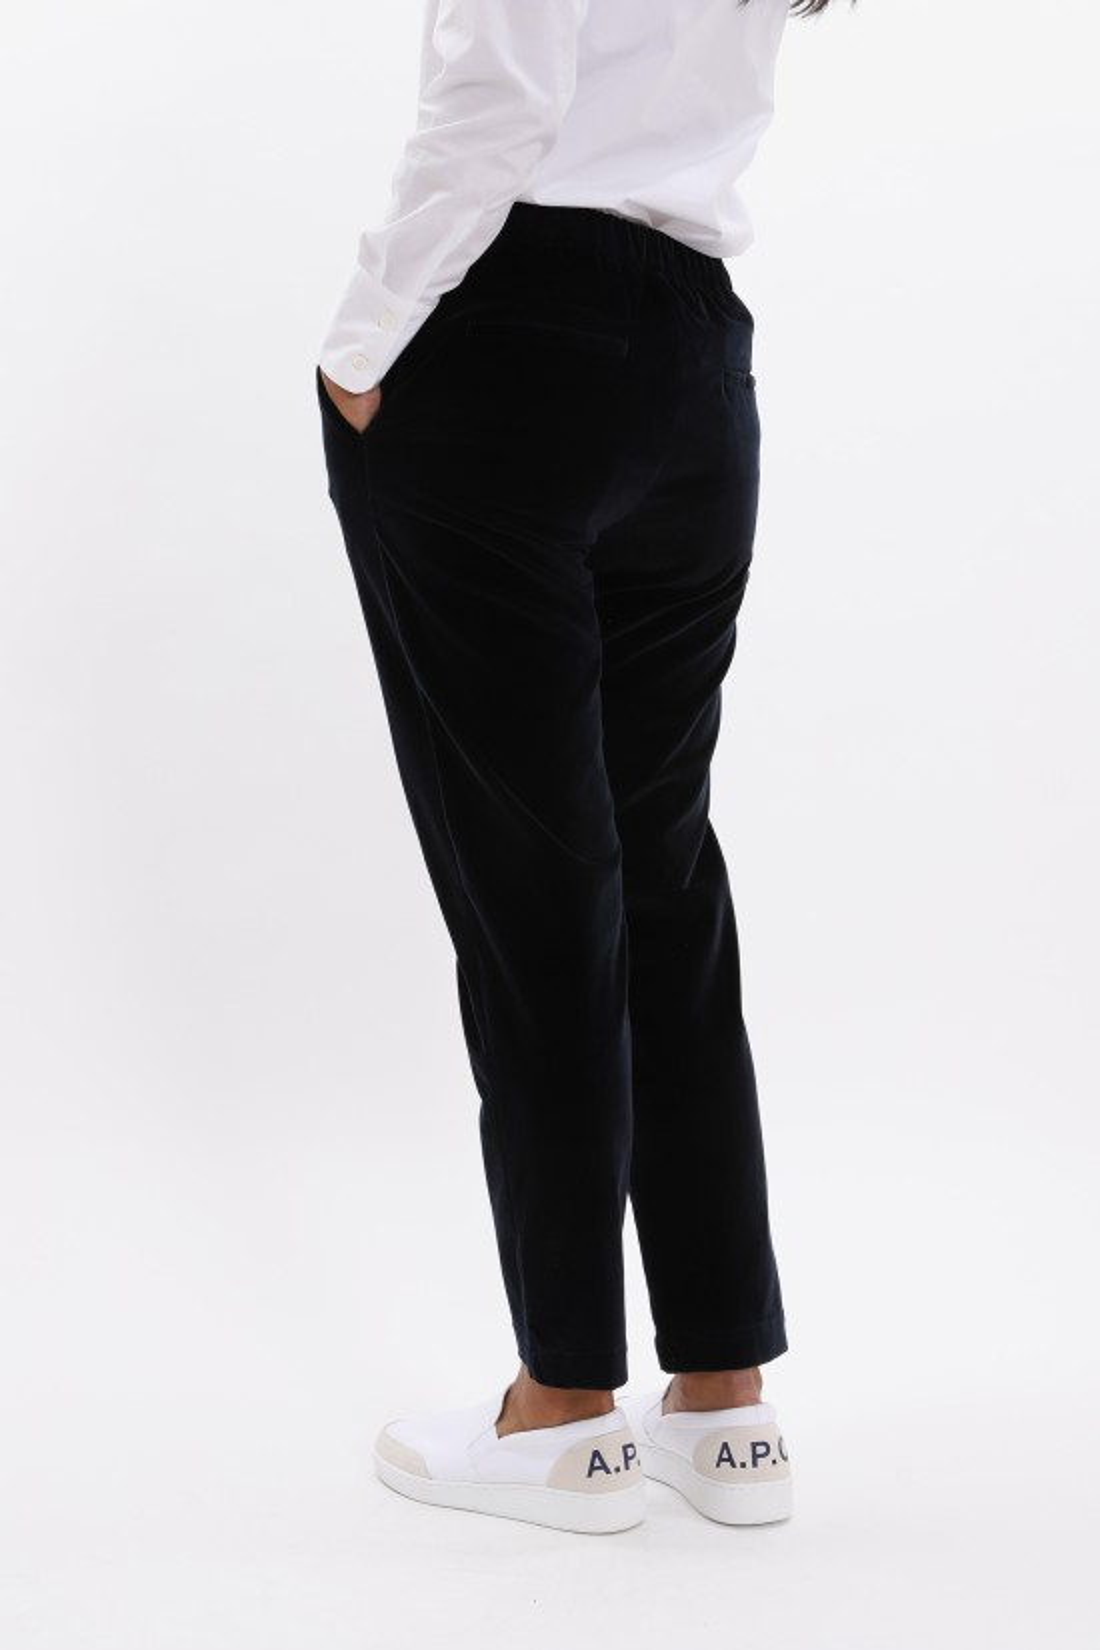 BARENA FOR WOMAN / Pantalone ersilia loredan Notte